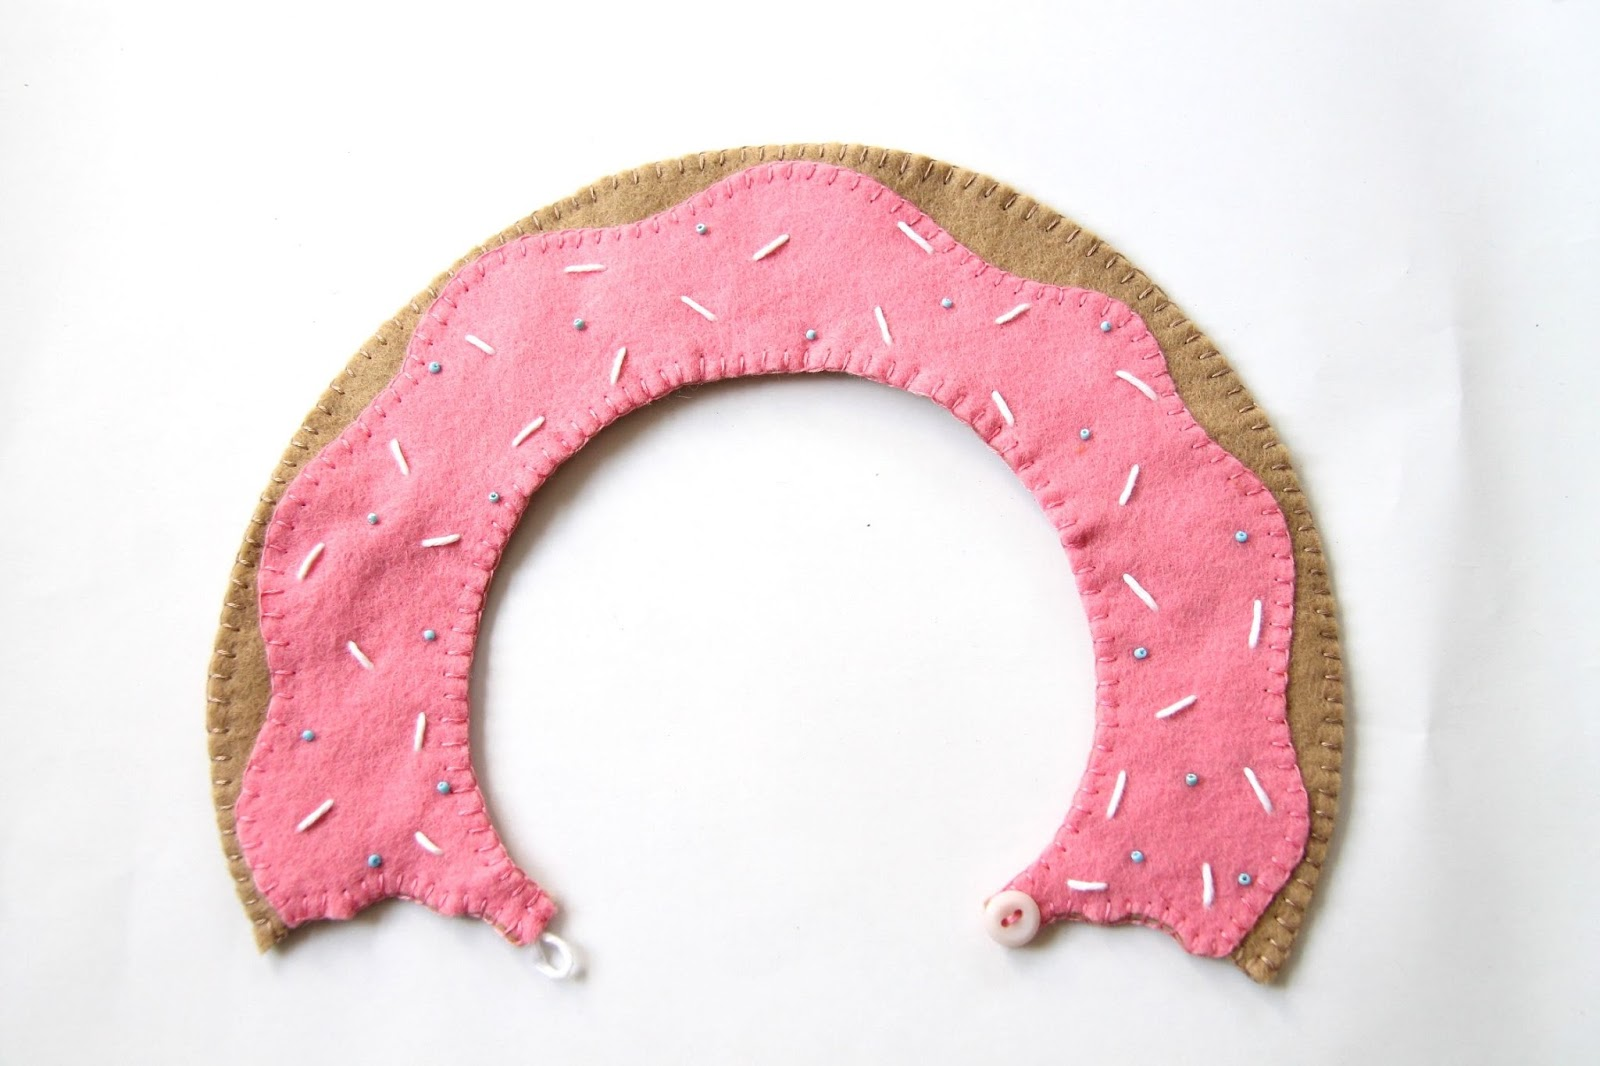 finished doughnut collar